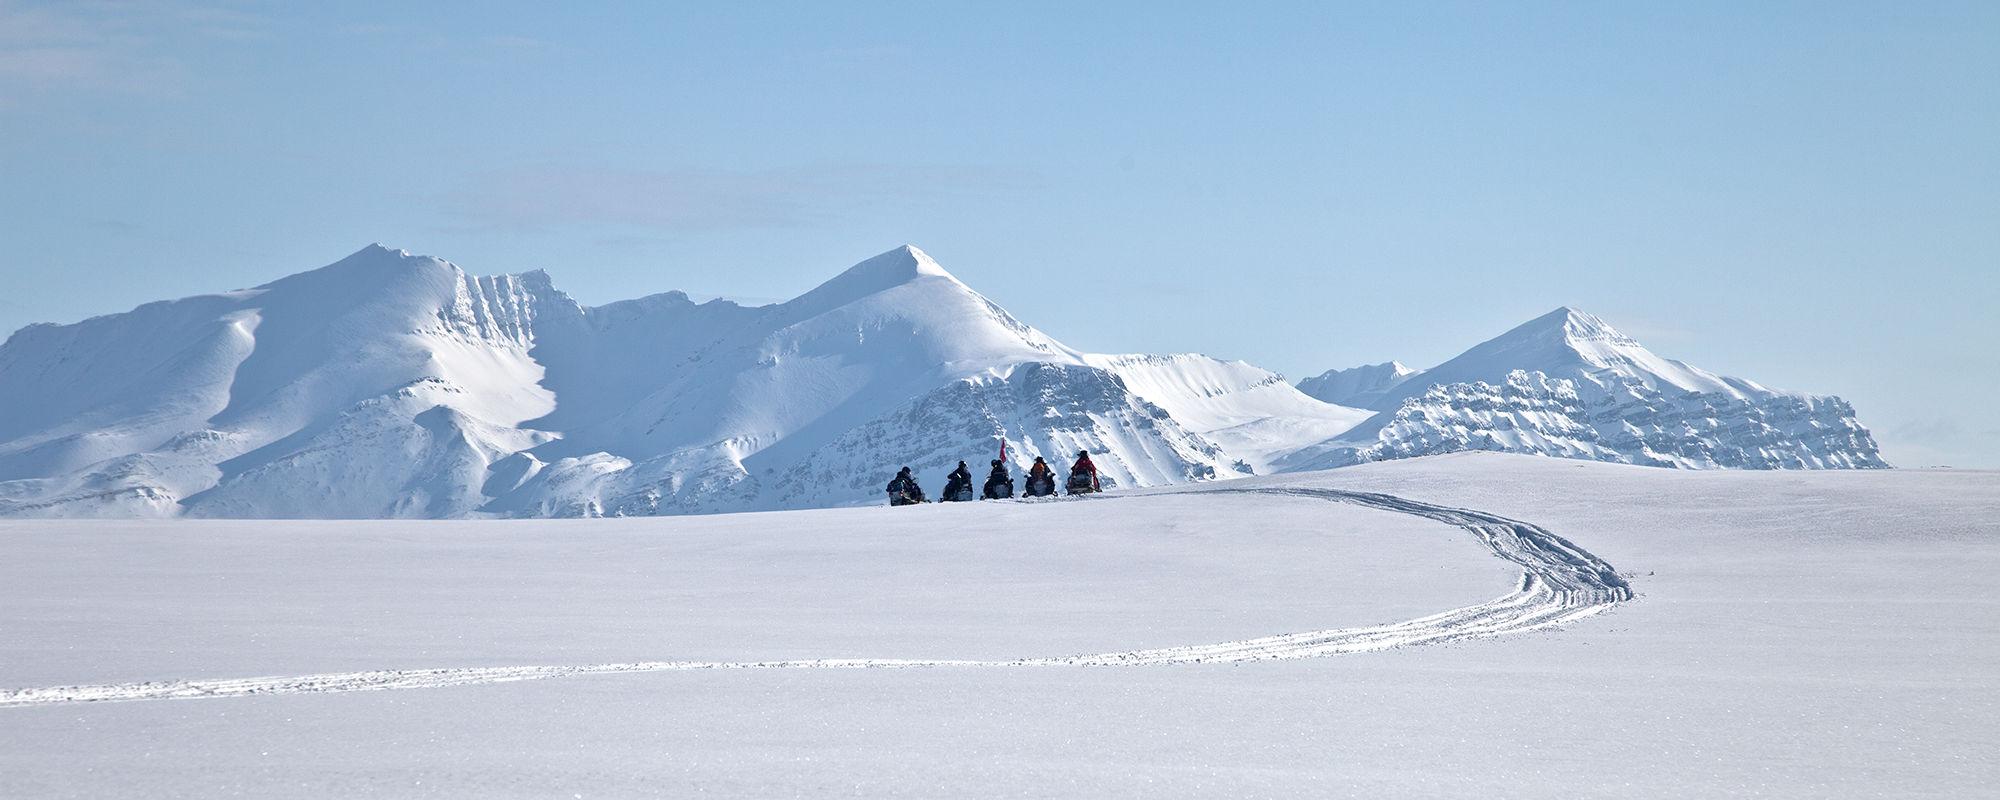 Schneescooter Safari nach Isfjord Radio